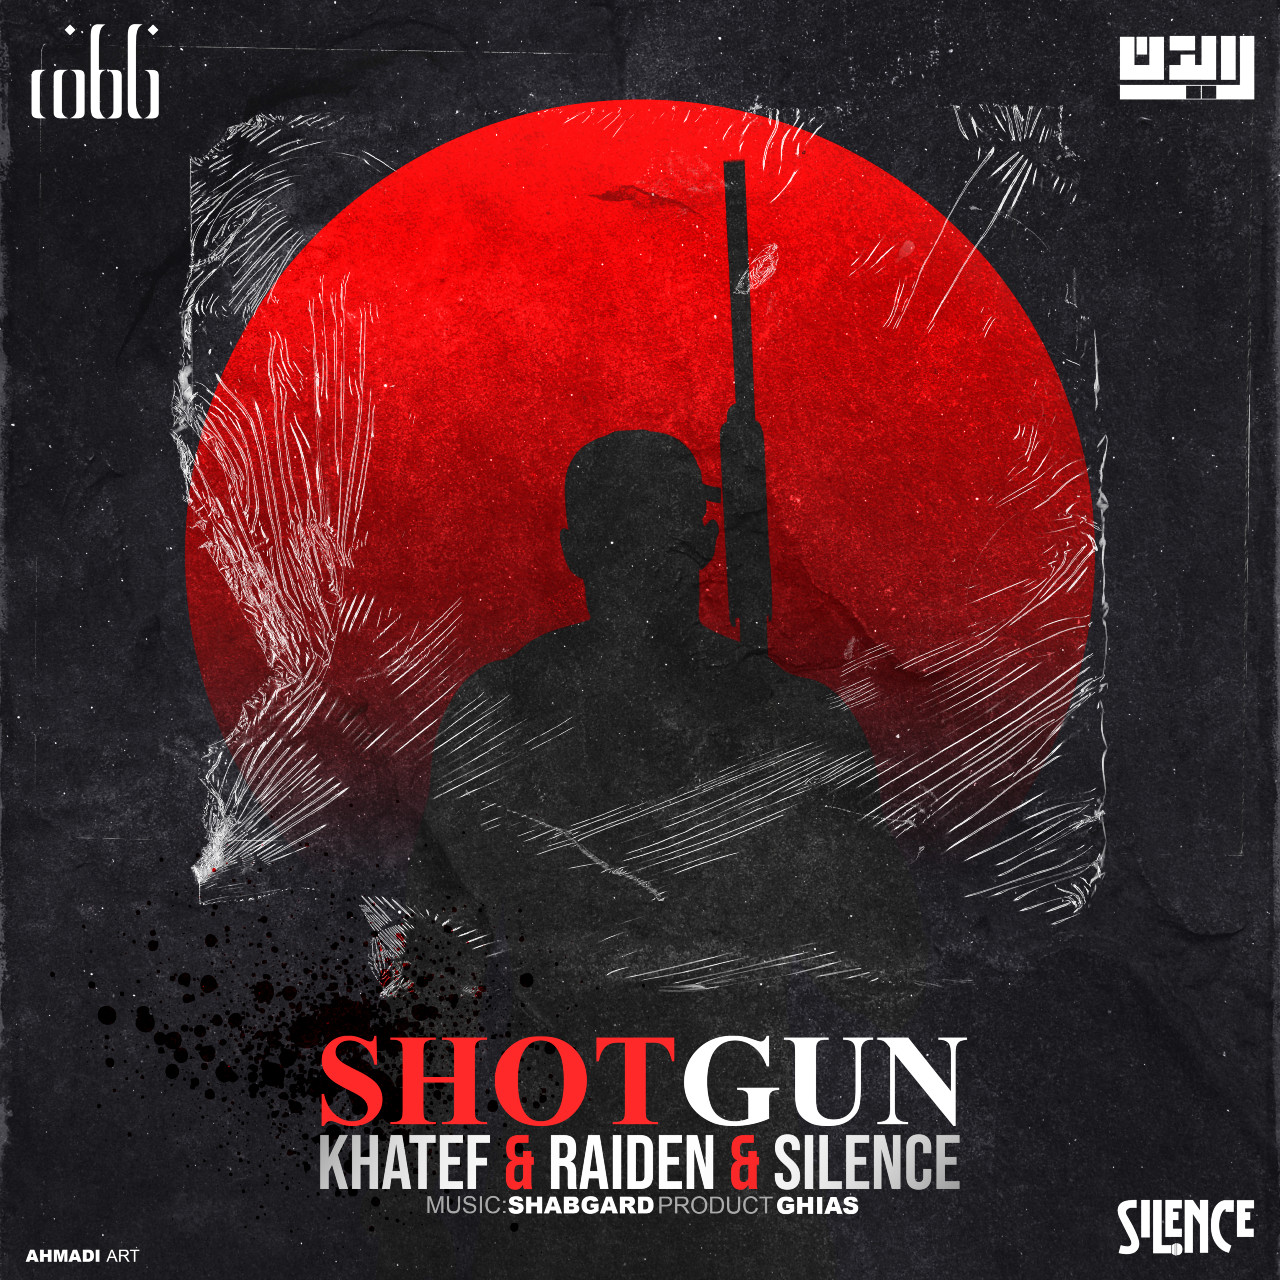 Khatef & Raiden & Silence - ShotGun